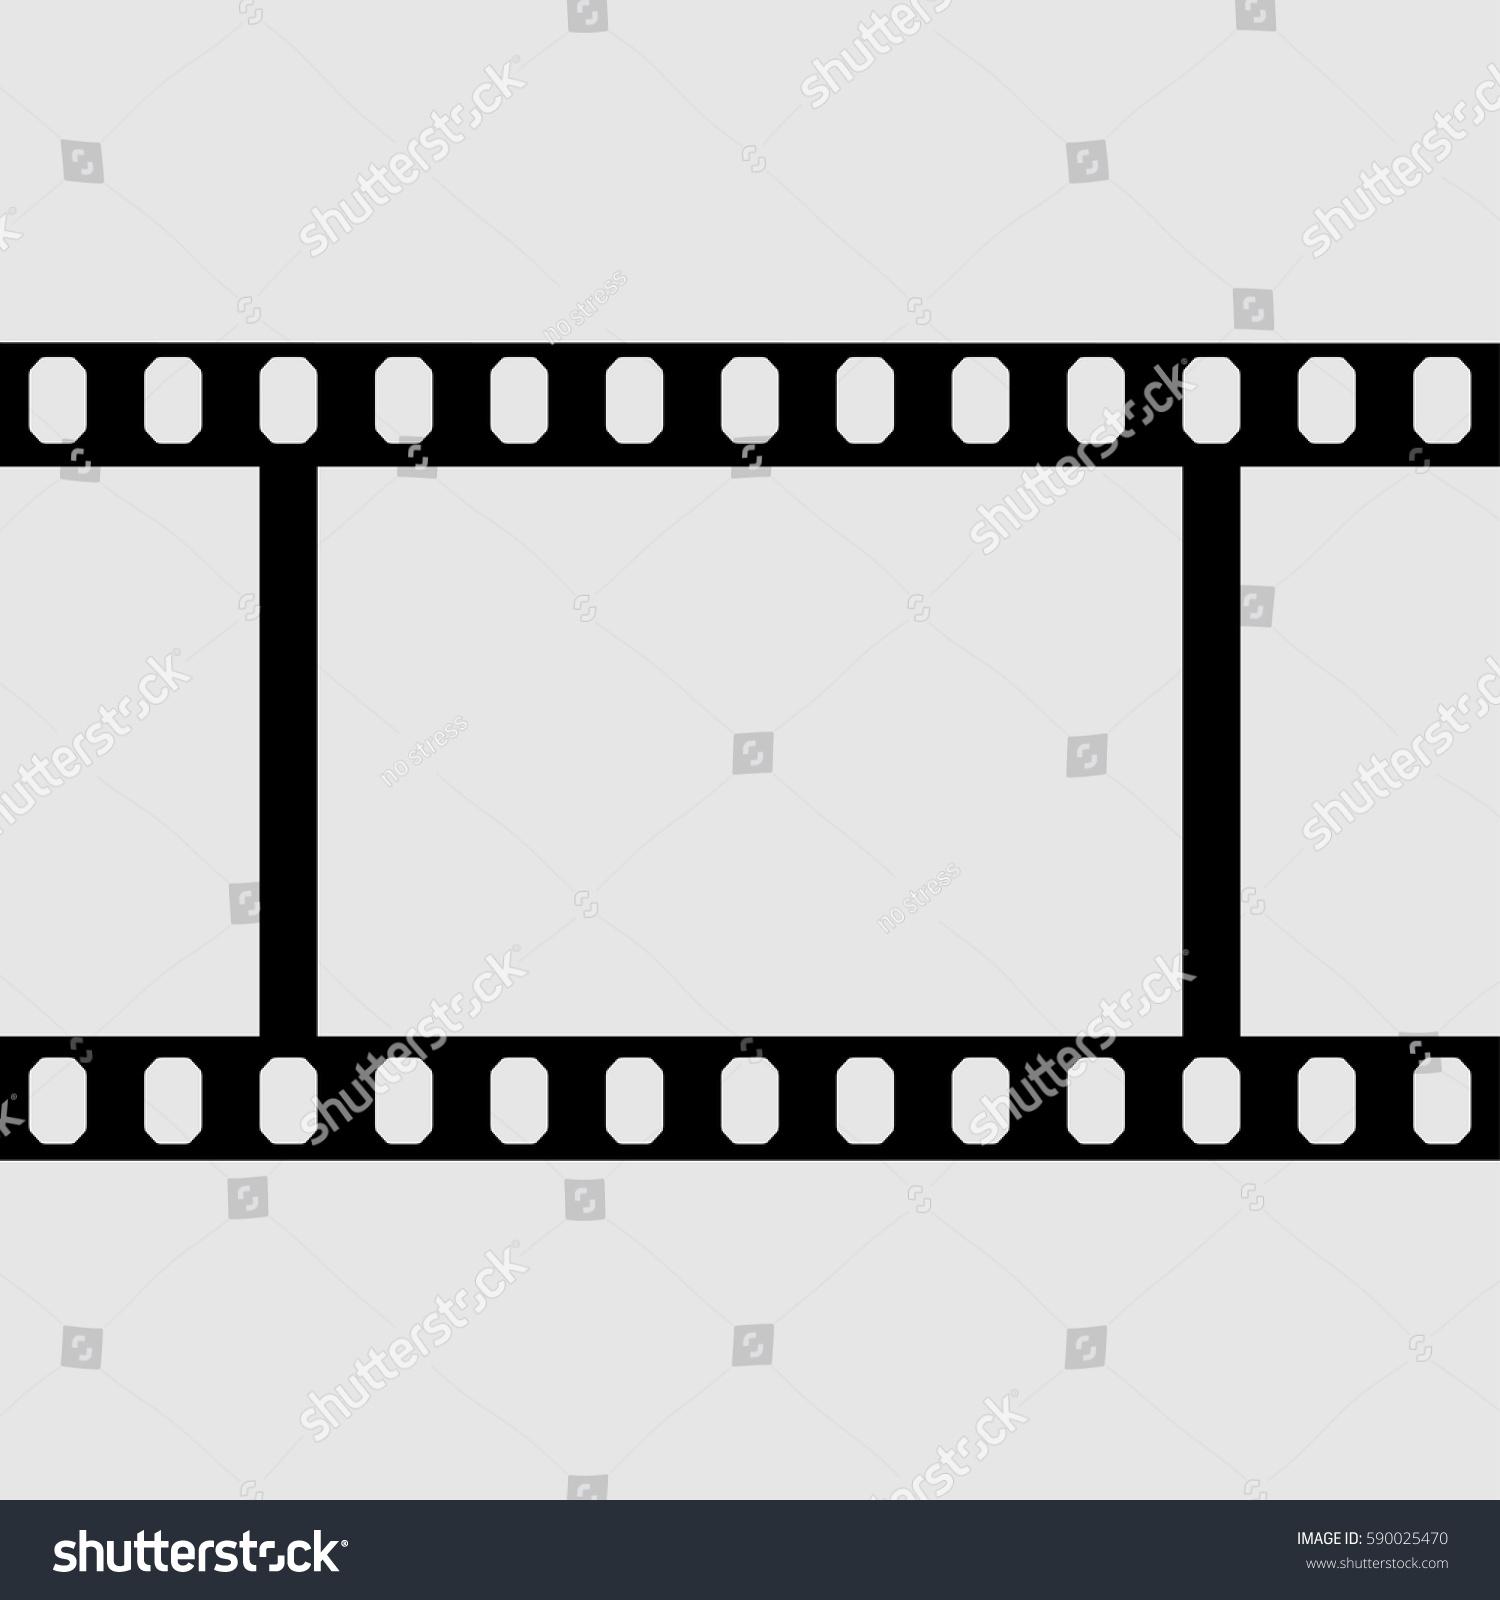 Eps 10 Vector Vintage Film Strip Stock Vector 590025470 - Shutterstock